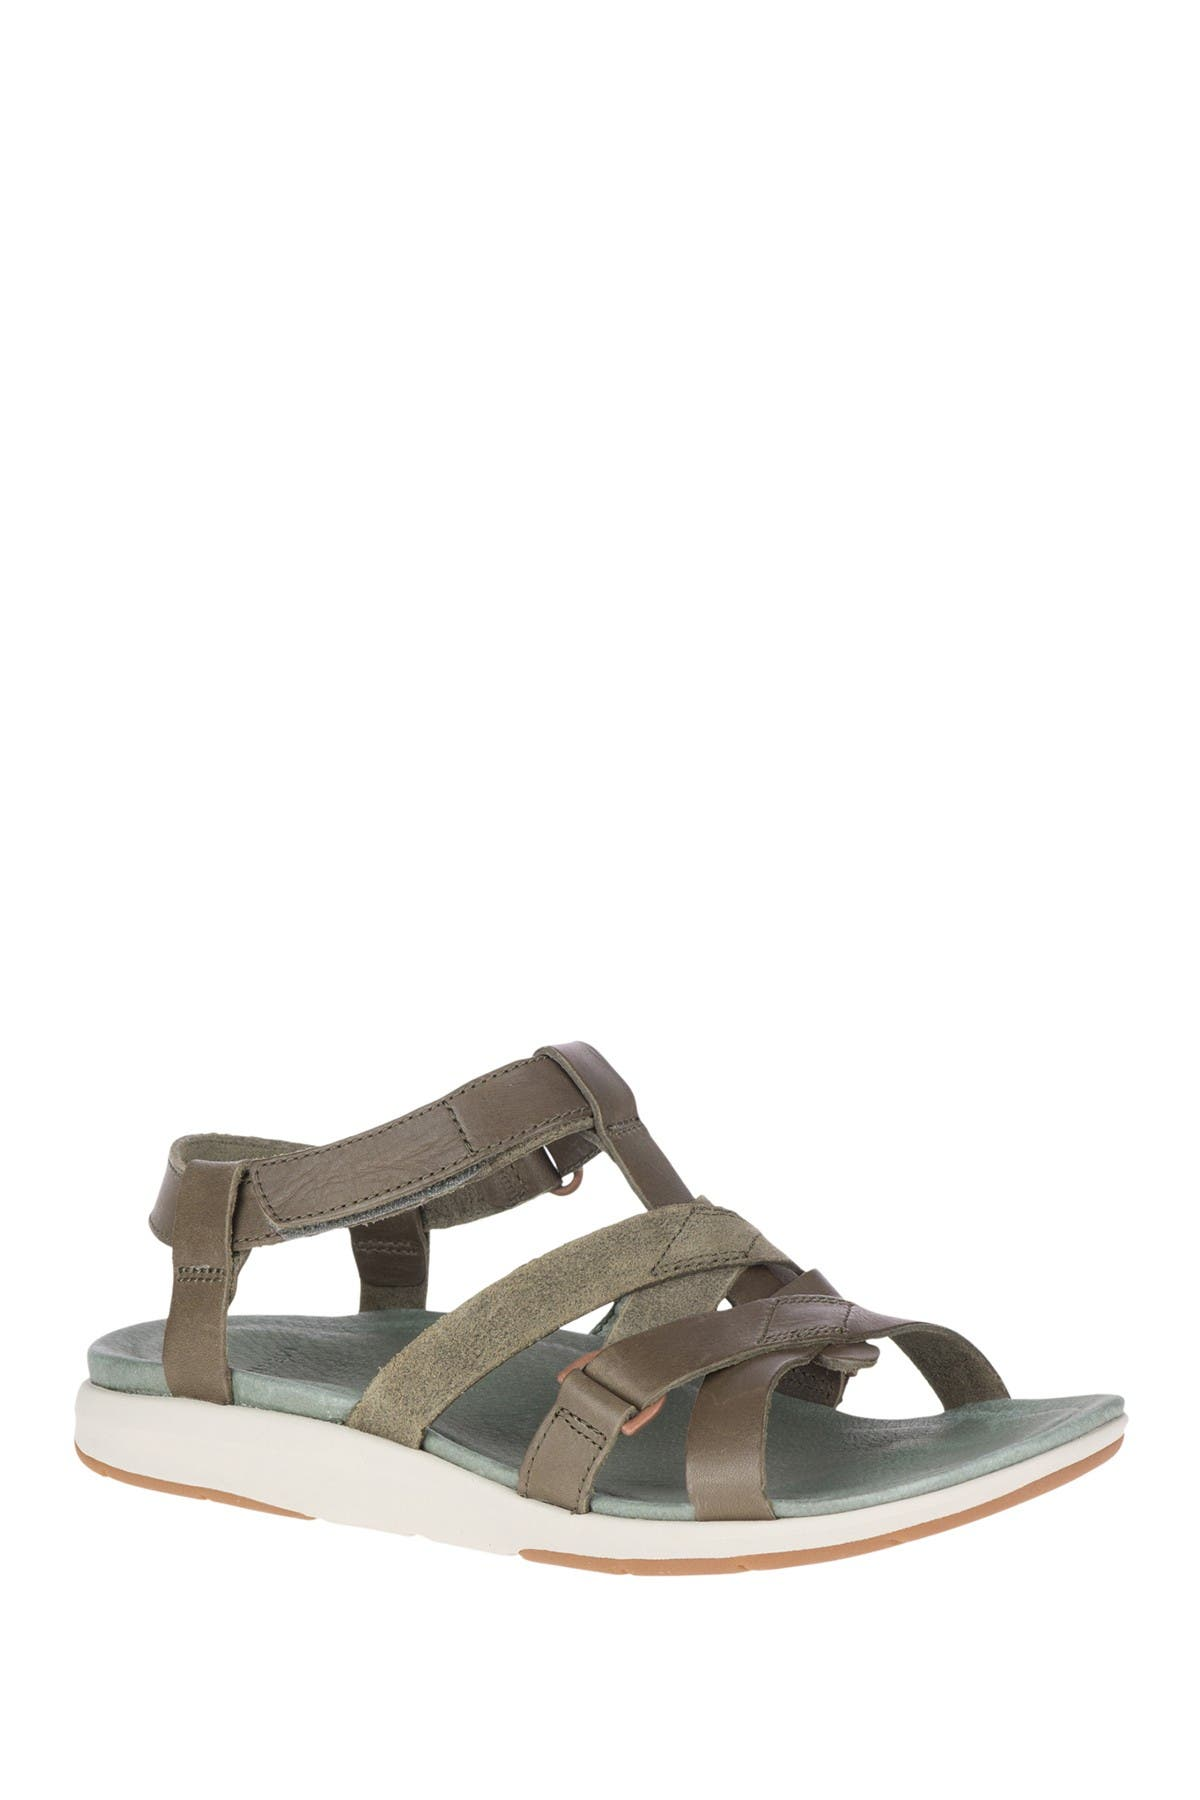 Image of Merrell Kalari Shaw Strappy Leather Sandal